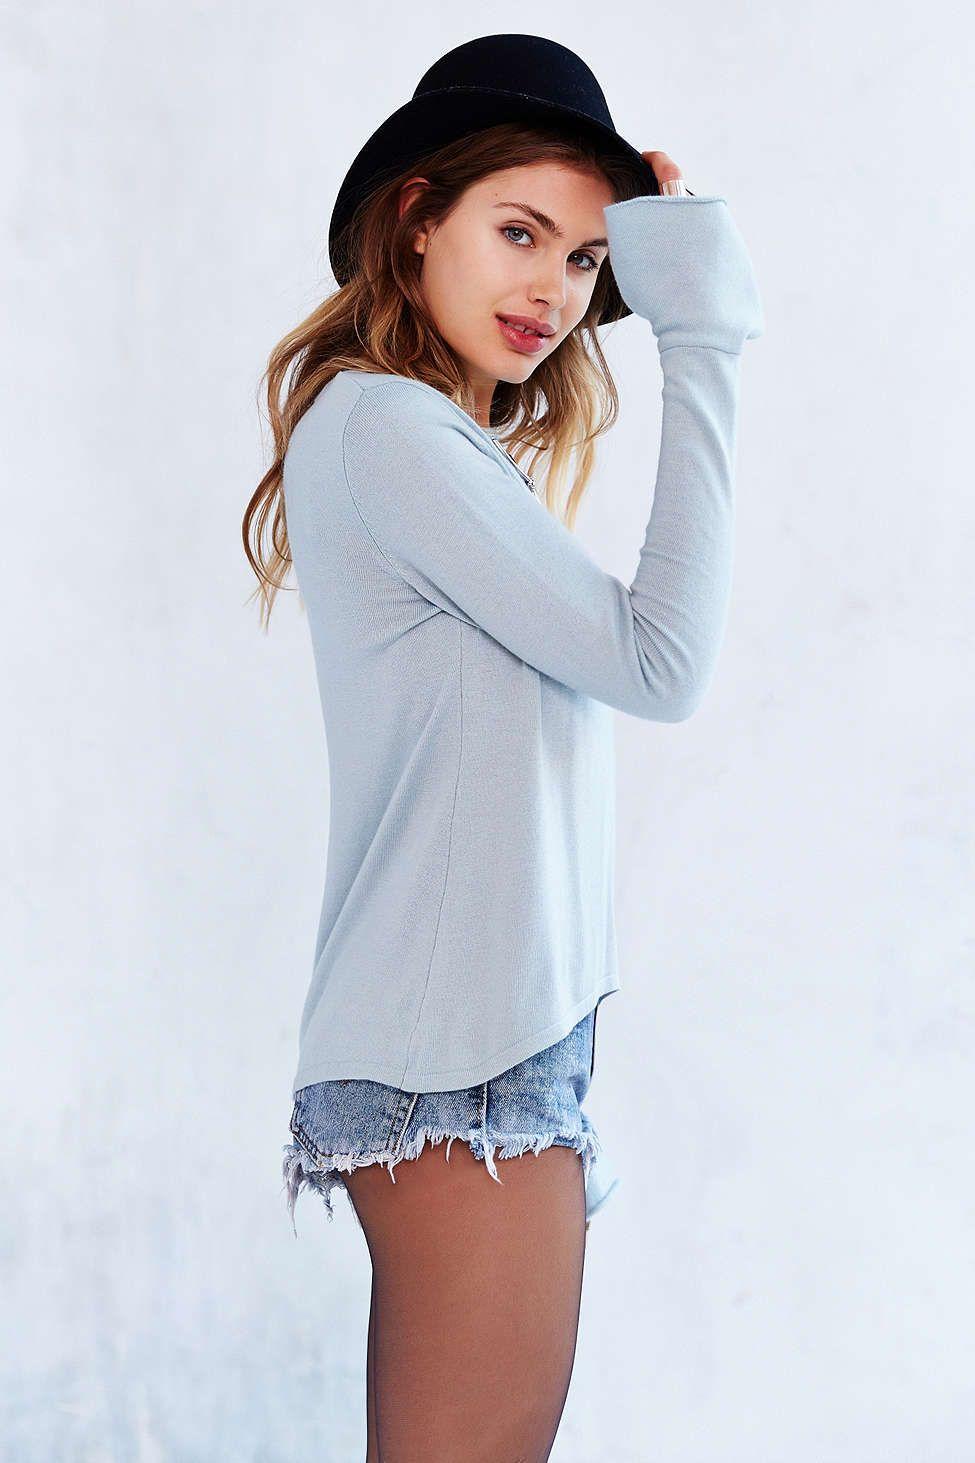 KNITZ By For Love & Lemons Nightcap Sweater